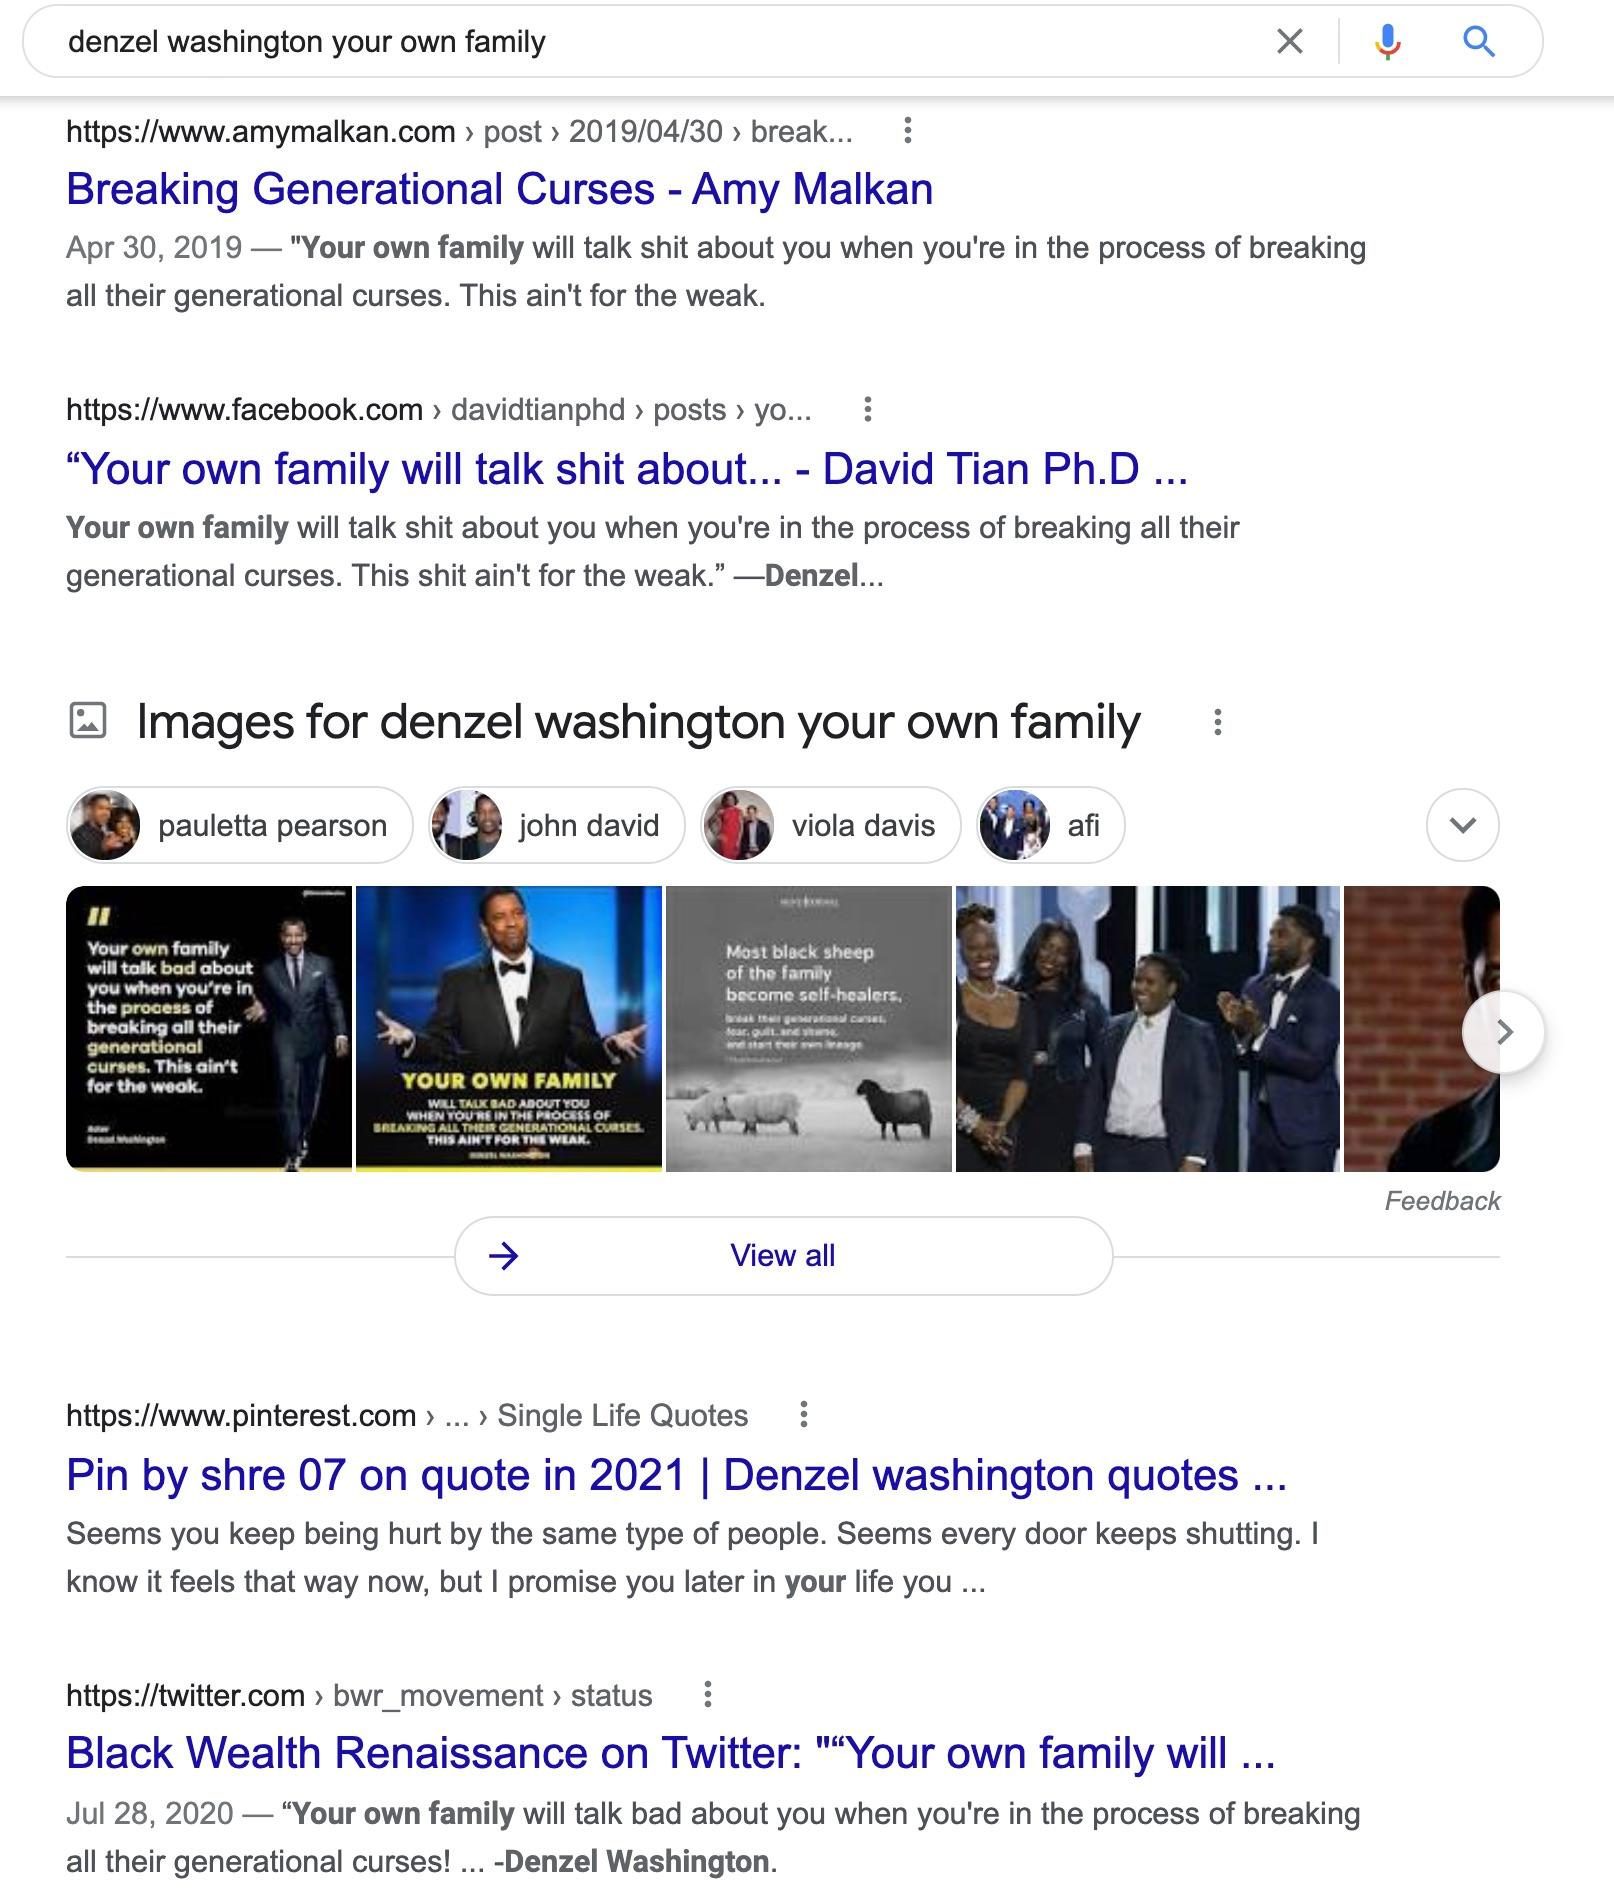 denzel washington your own family